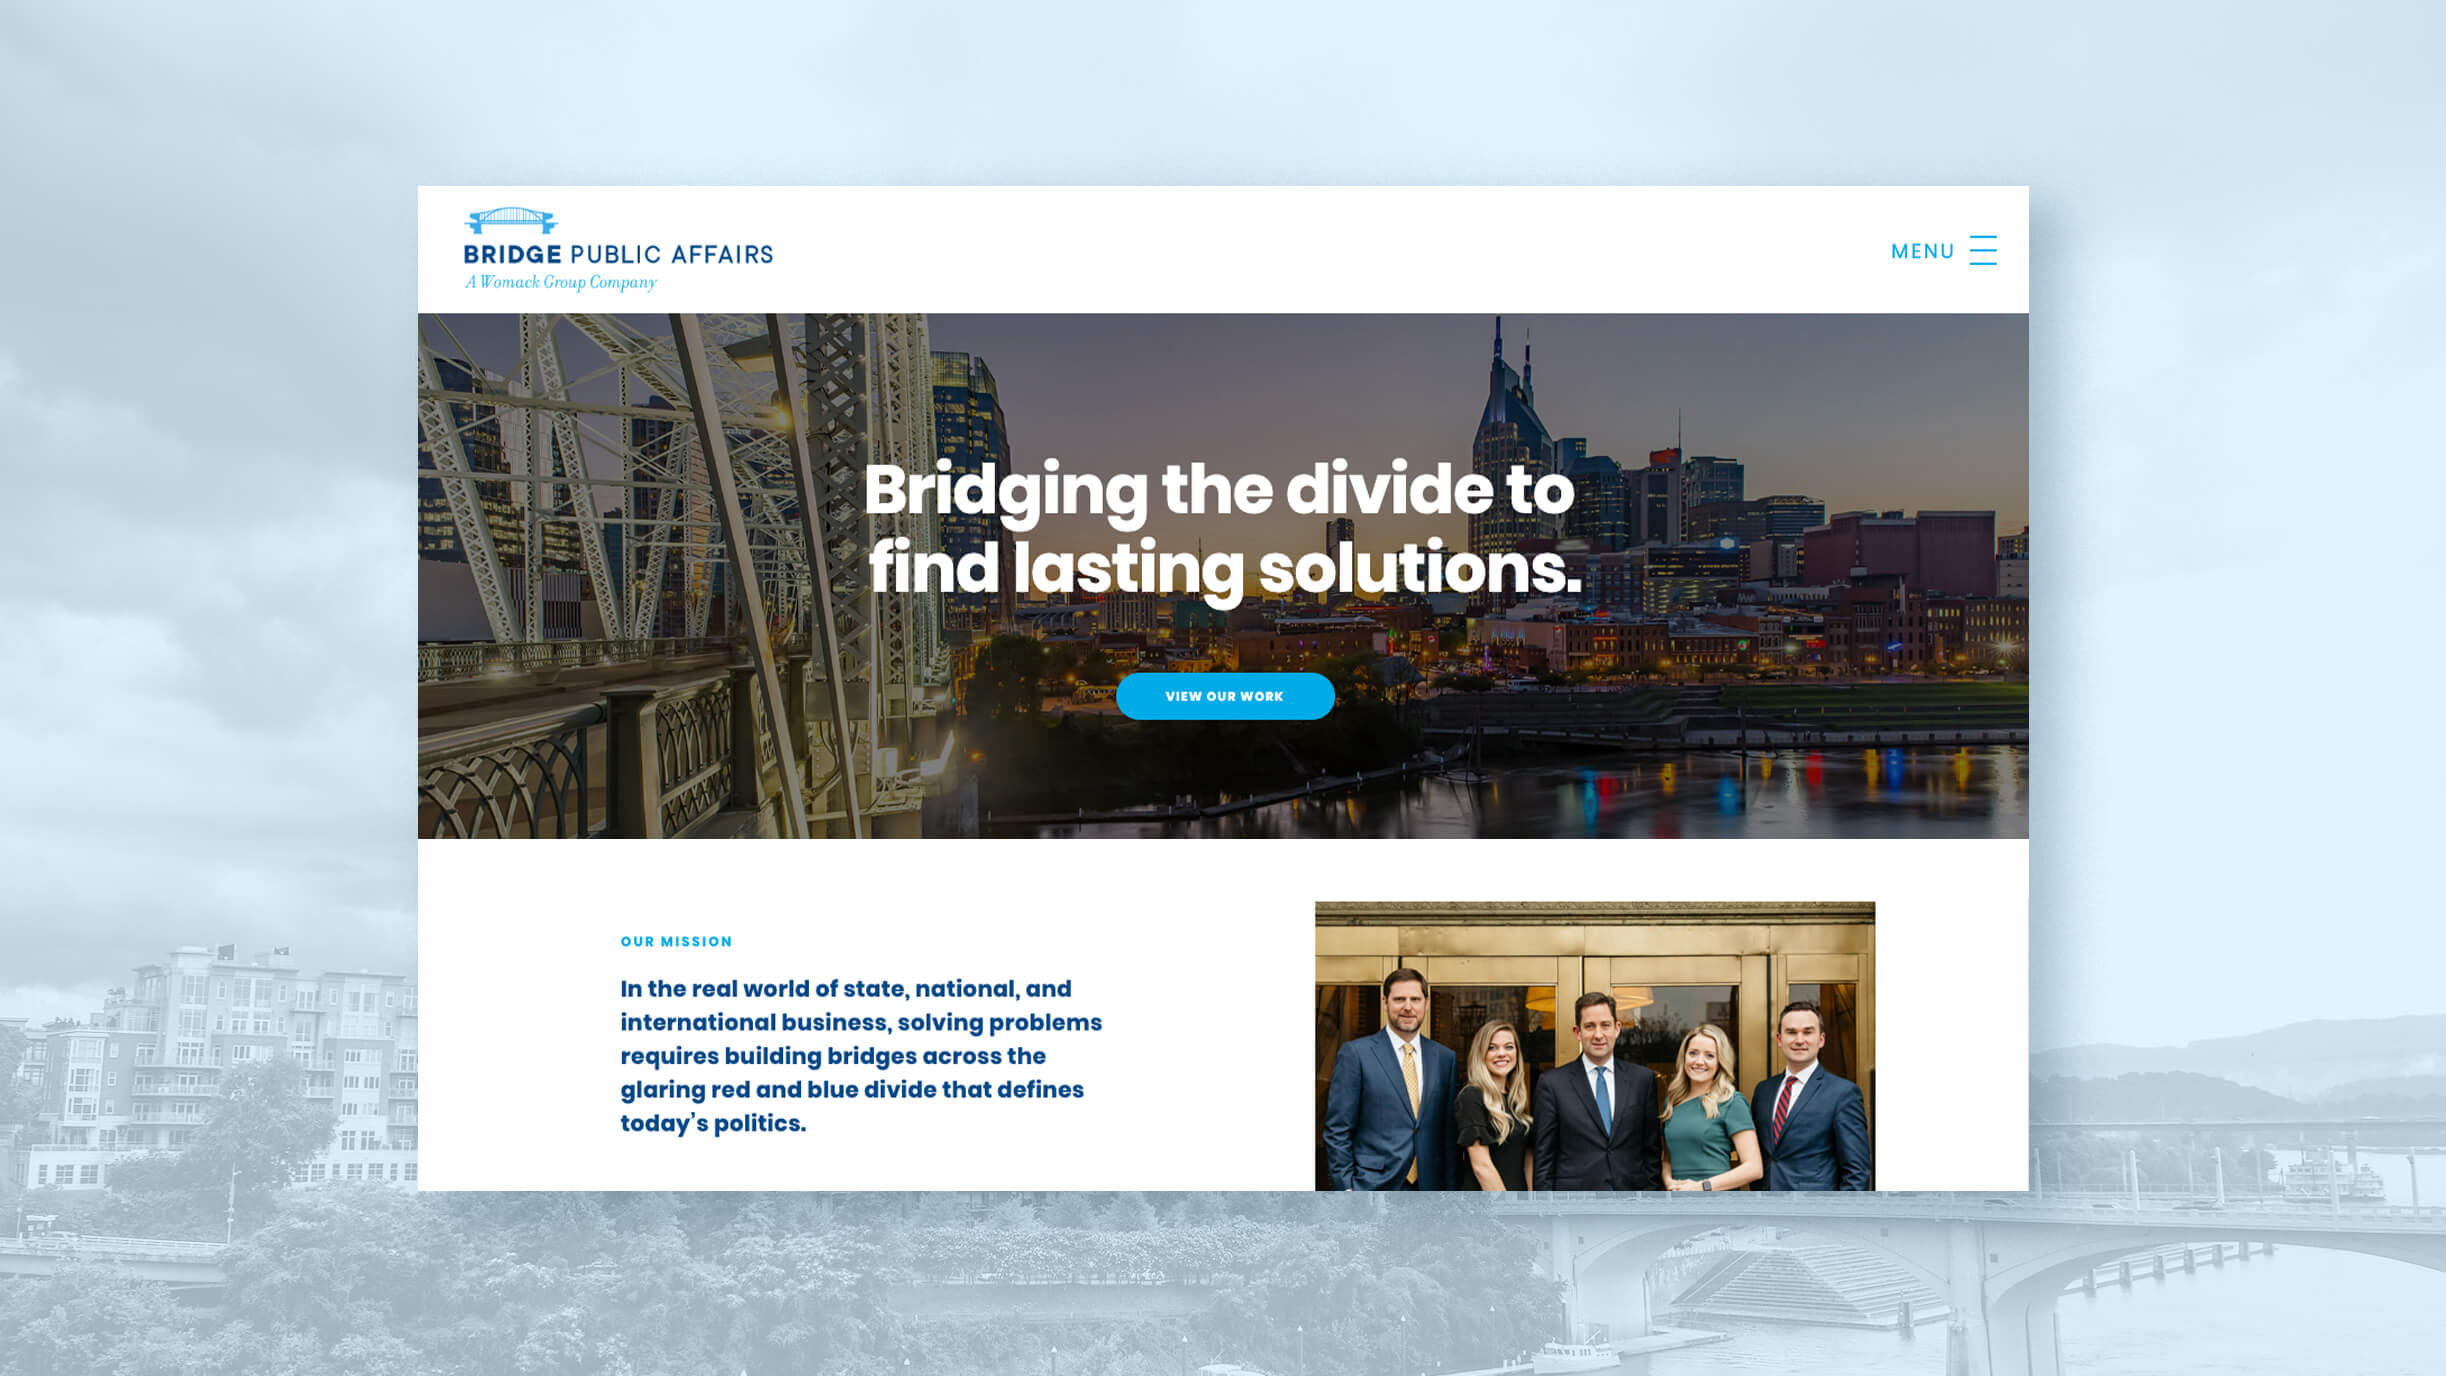 bridge-public-affairs-desktop.jpg